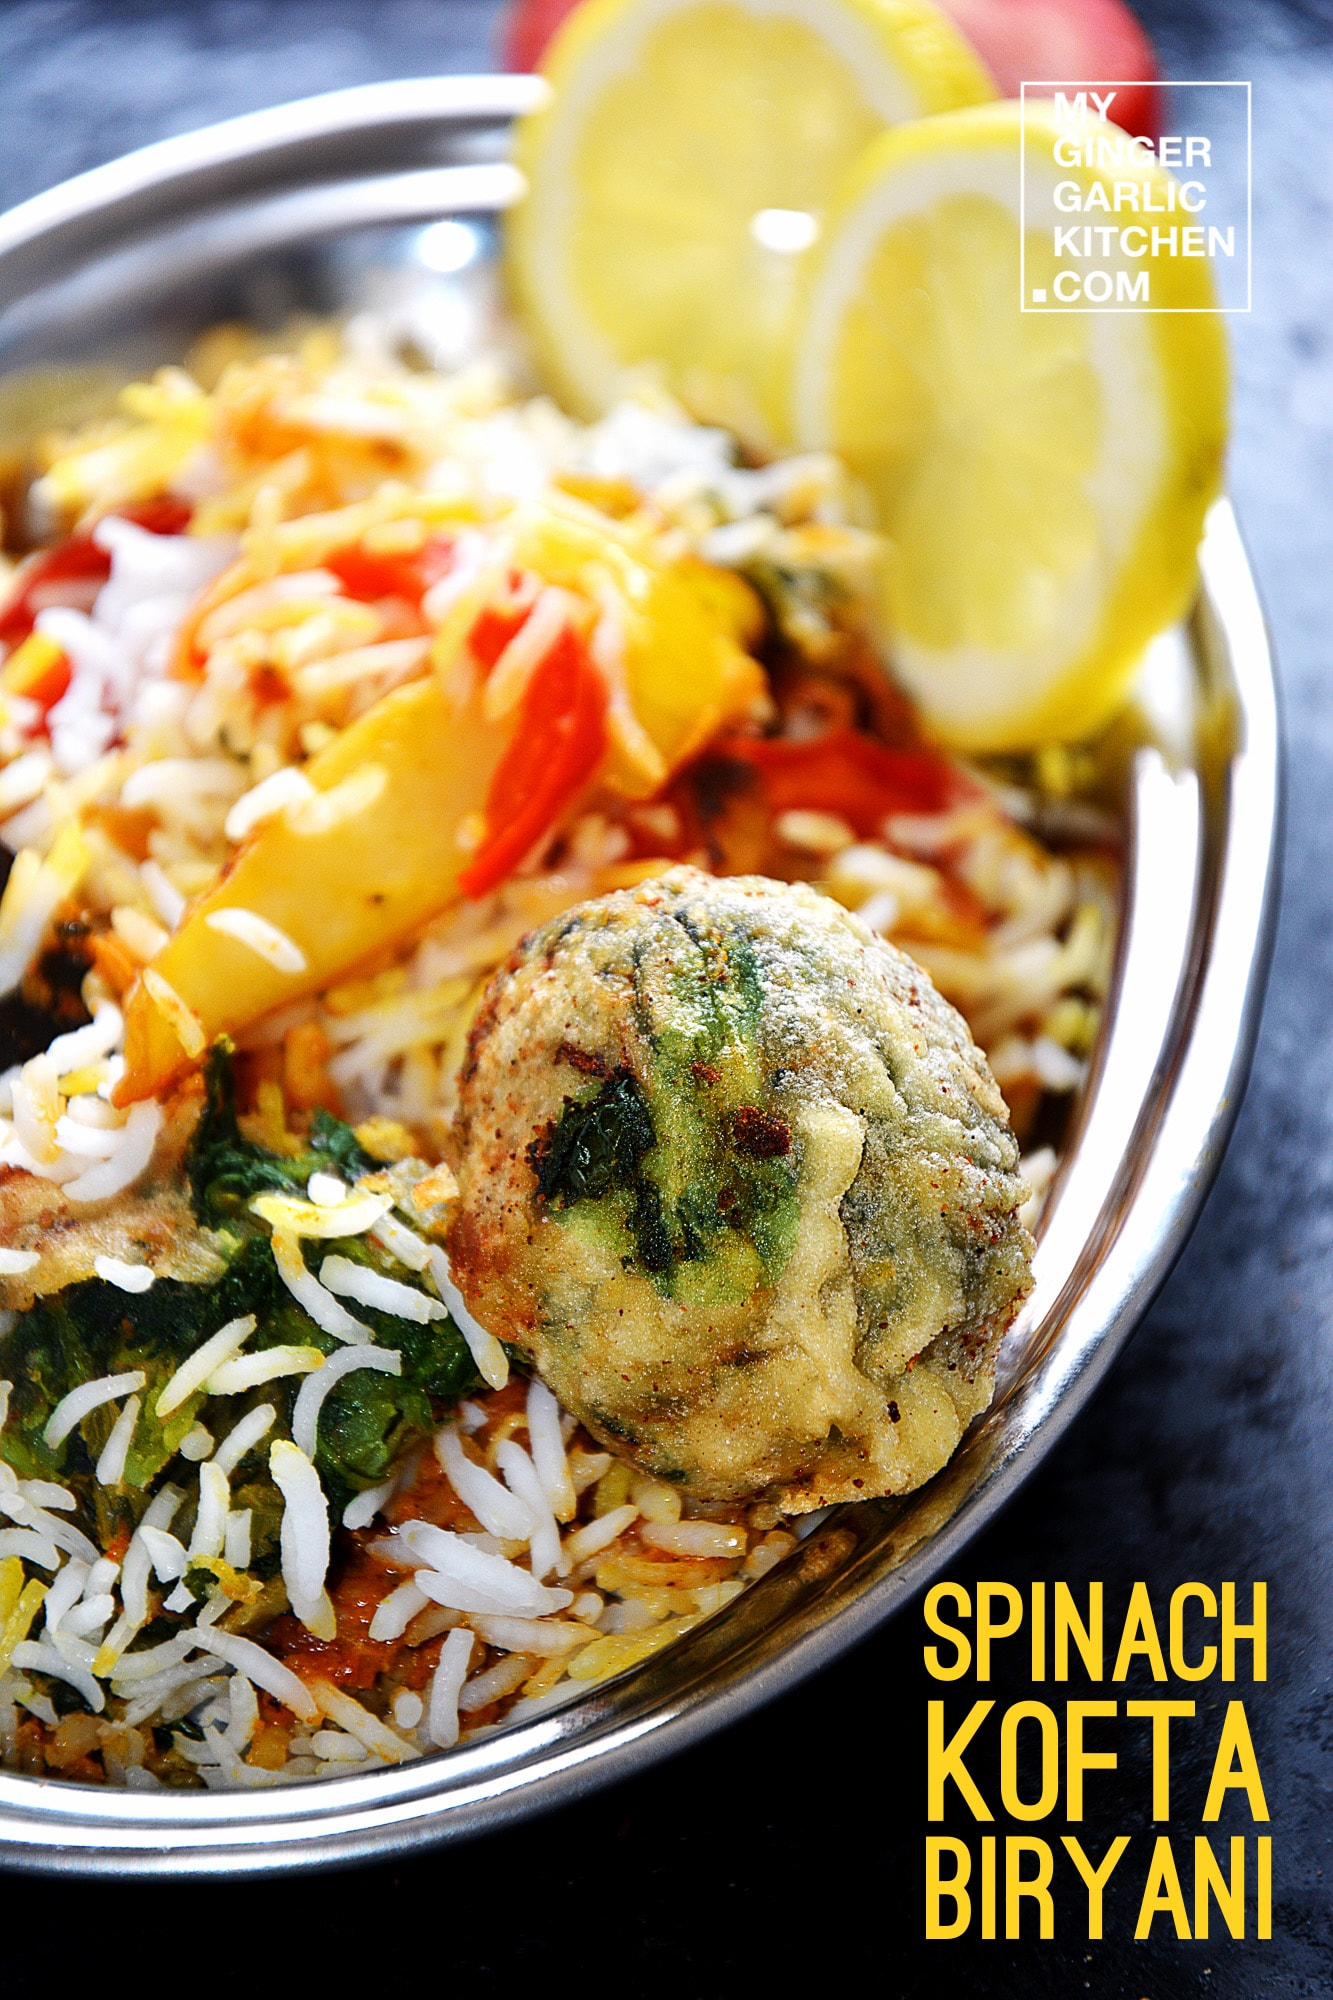 Image - recipe spinach kofta biryani anupama paliwal my ginger garlic kitchen 3 copy